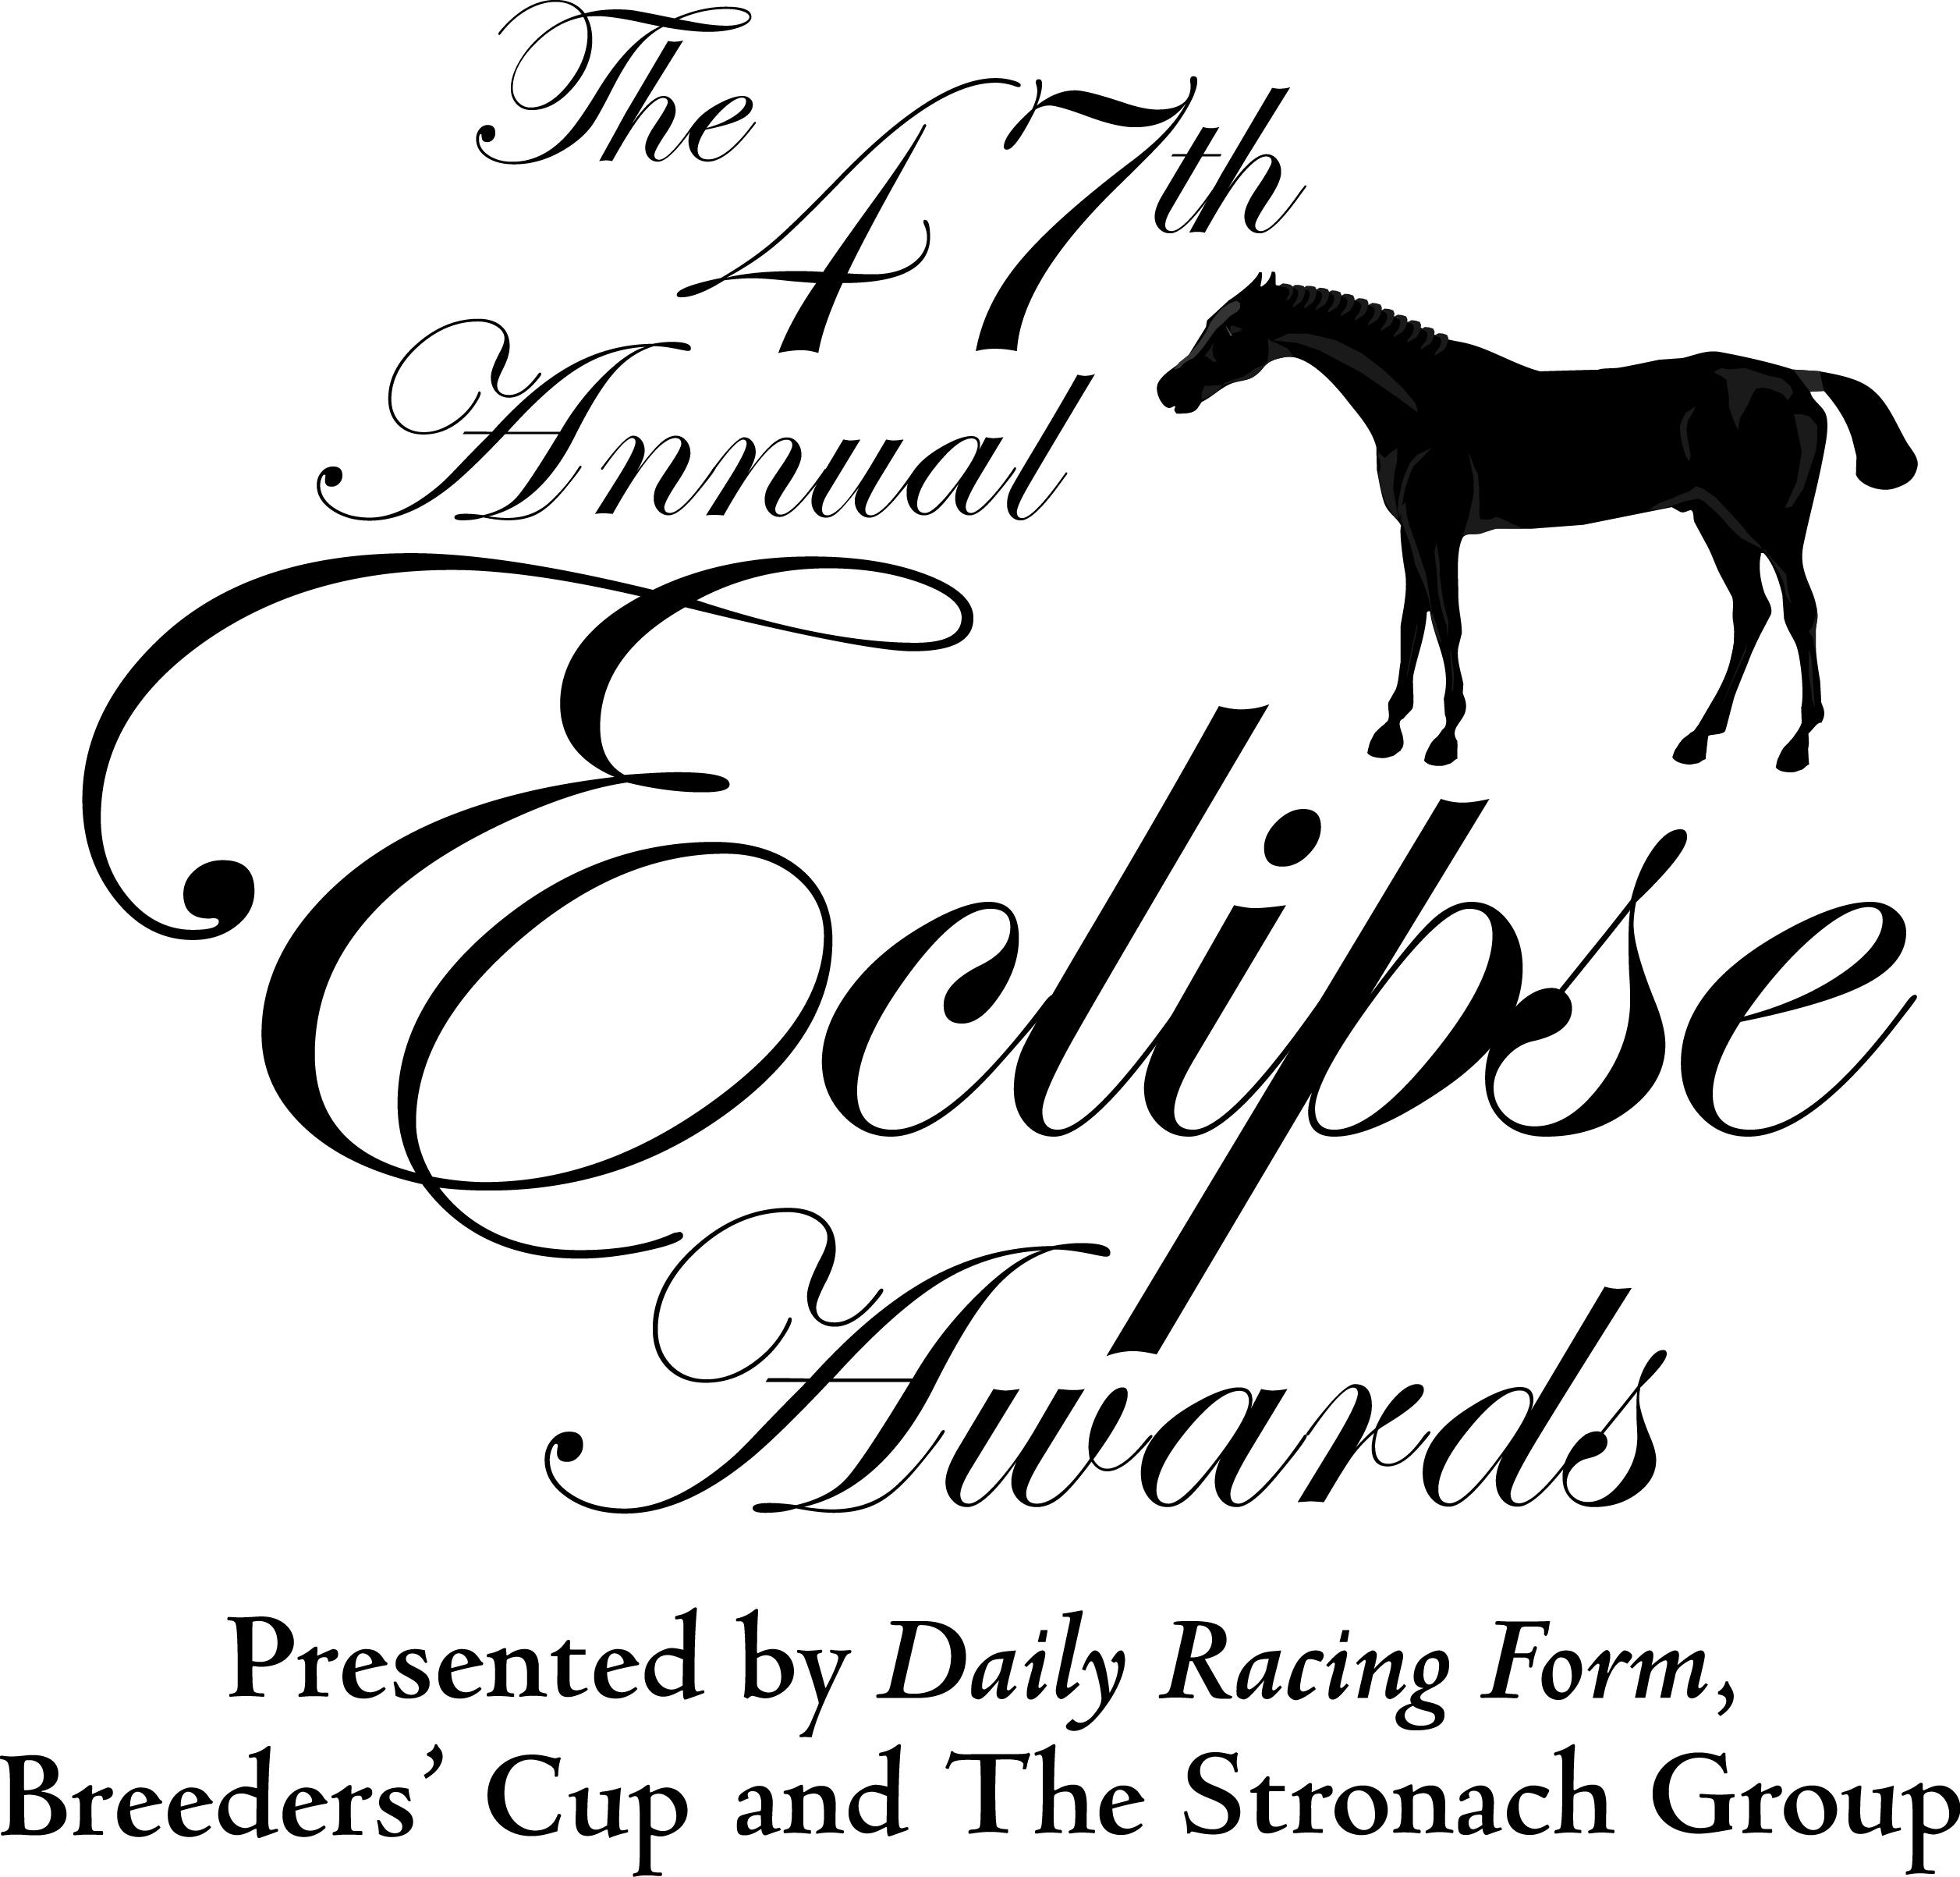 Trackside View » 47th Eclipse Awards: Gun Runner named